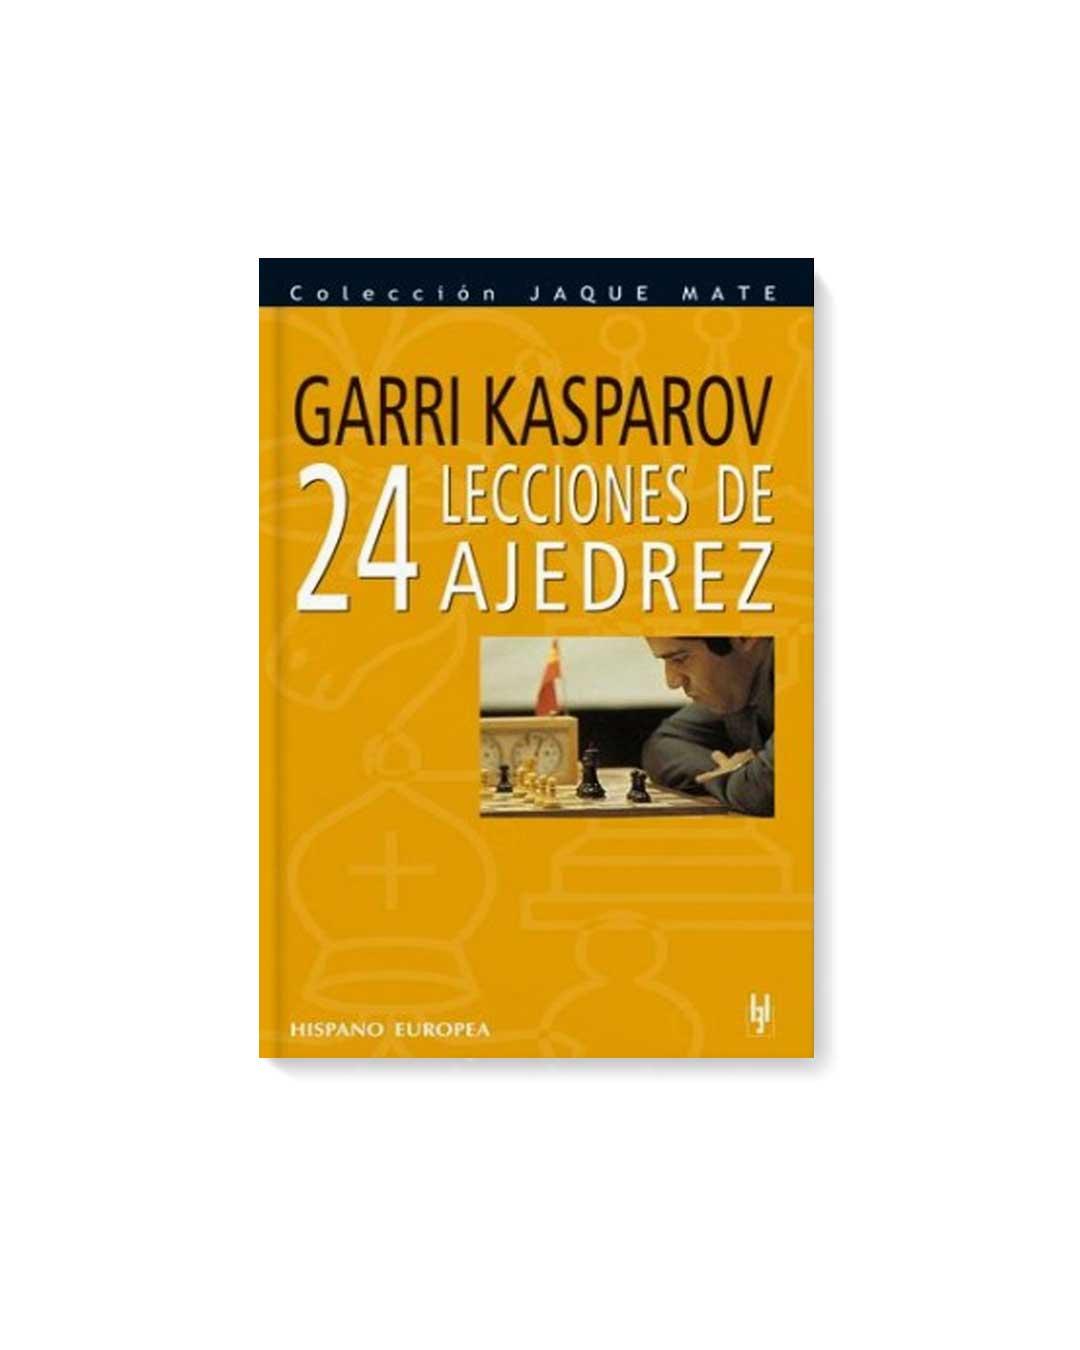 24 LECCIONES DE AJEDREZ - Kasparov